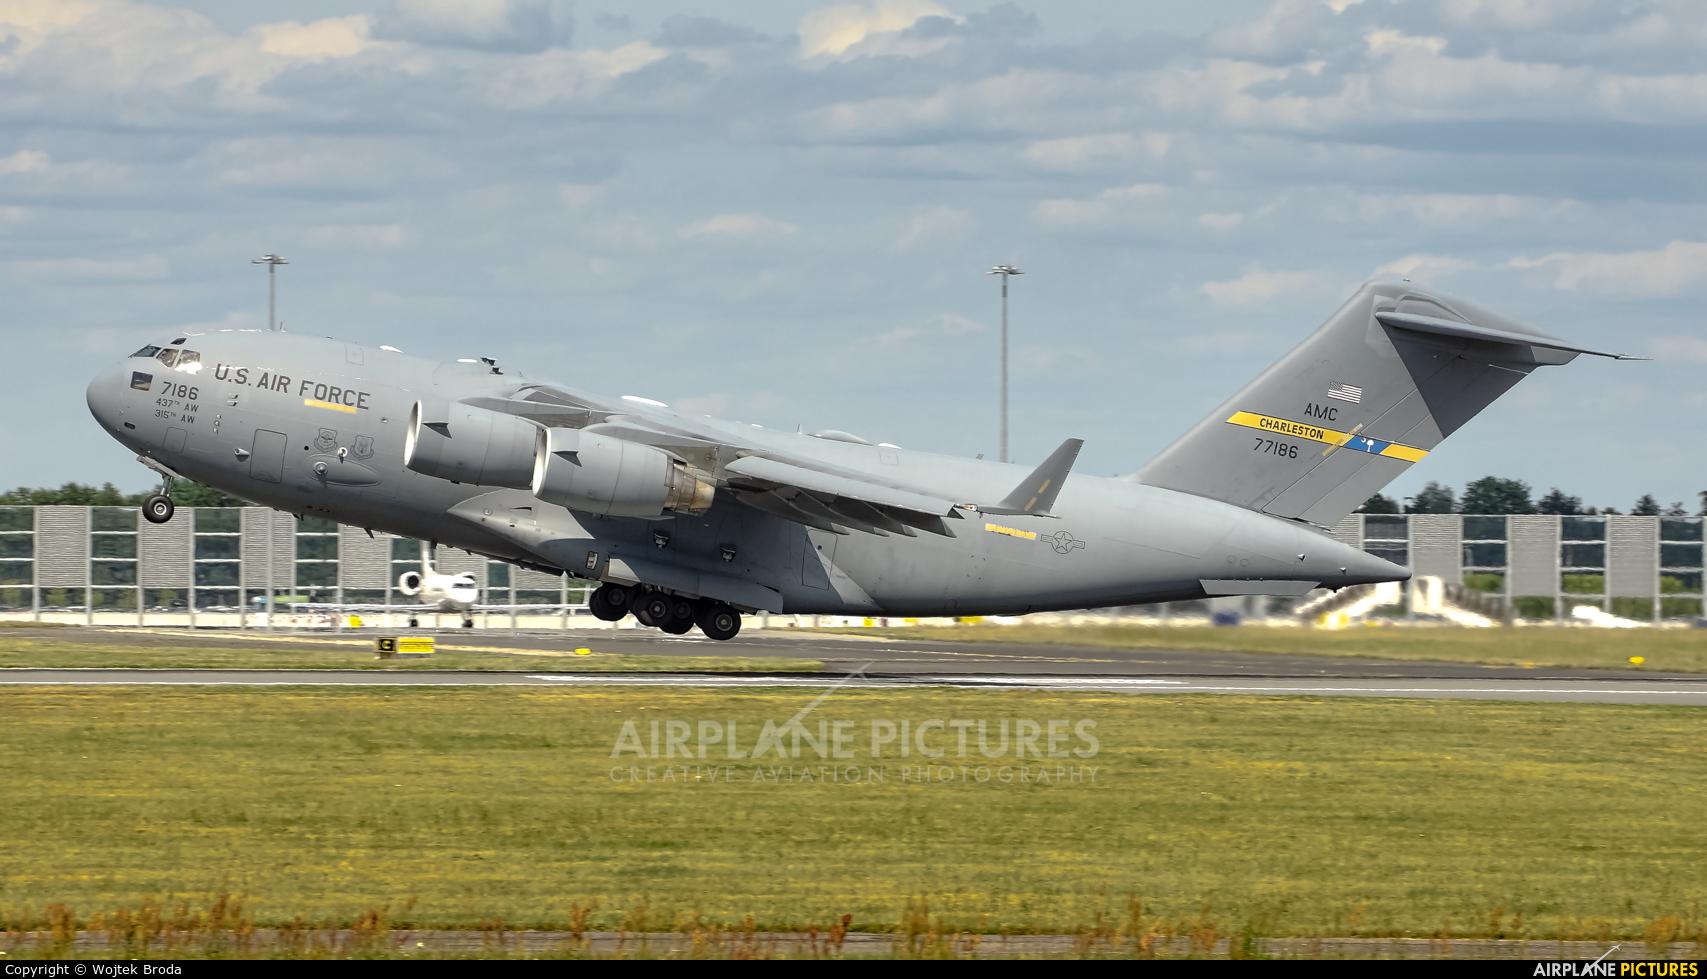 USA - Air Force 07-7186 aircraft at Wrocław - Copernicus